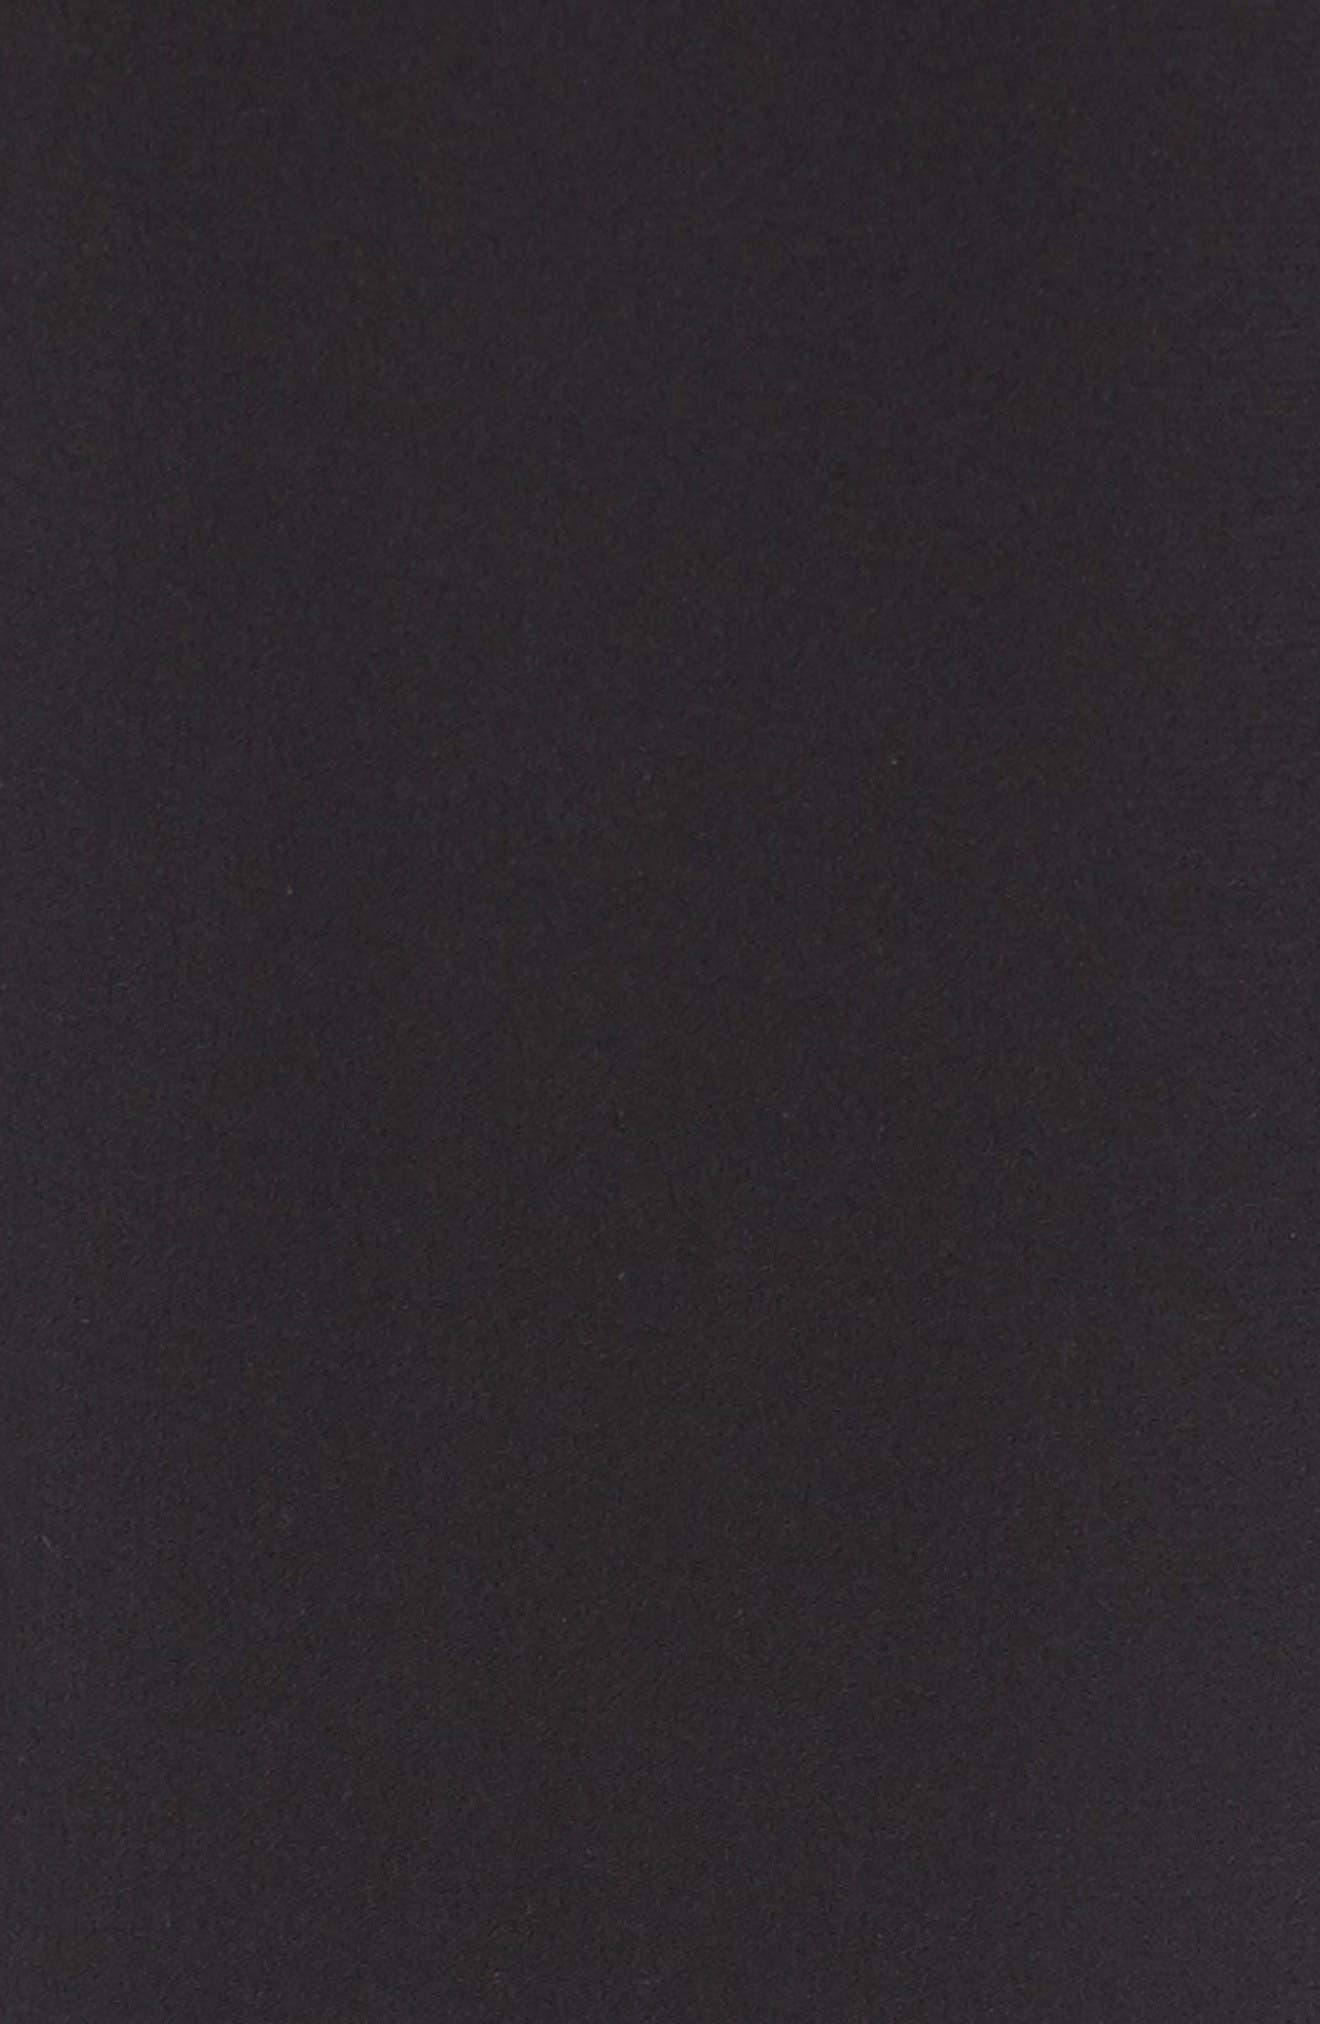 Slouchy Silk Crepe Ankle Pants,                             Alternate thumbnail 6, color,                             Black